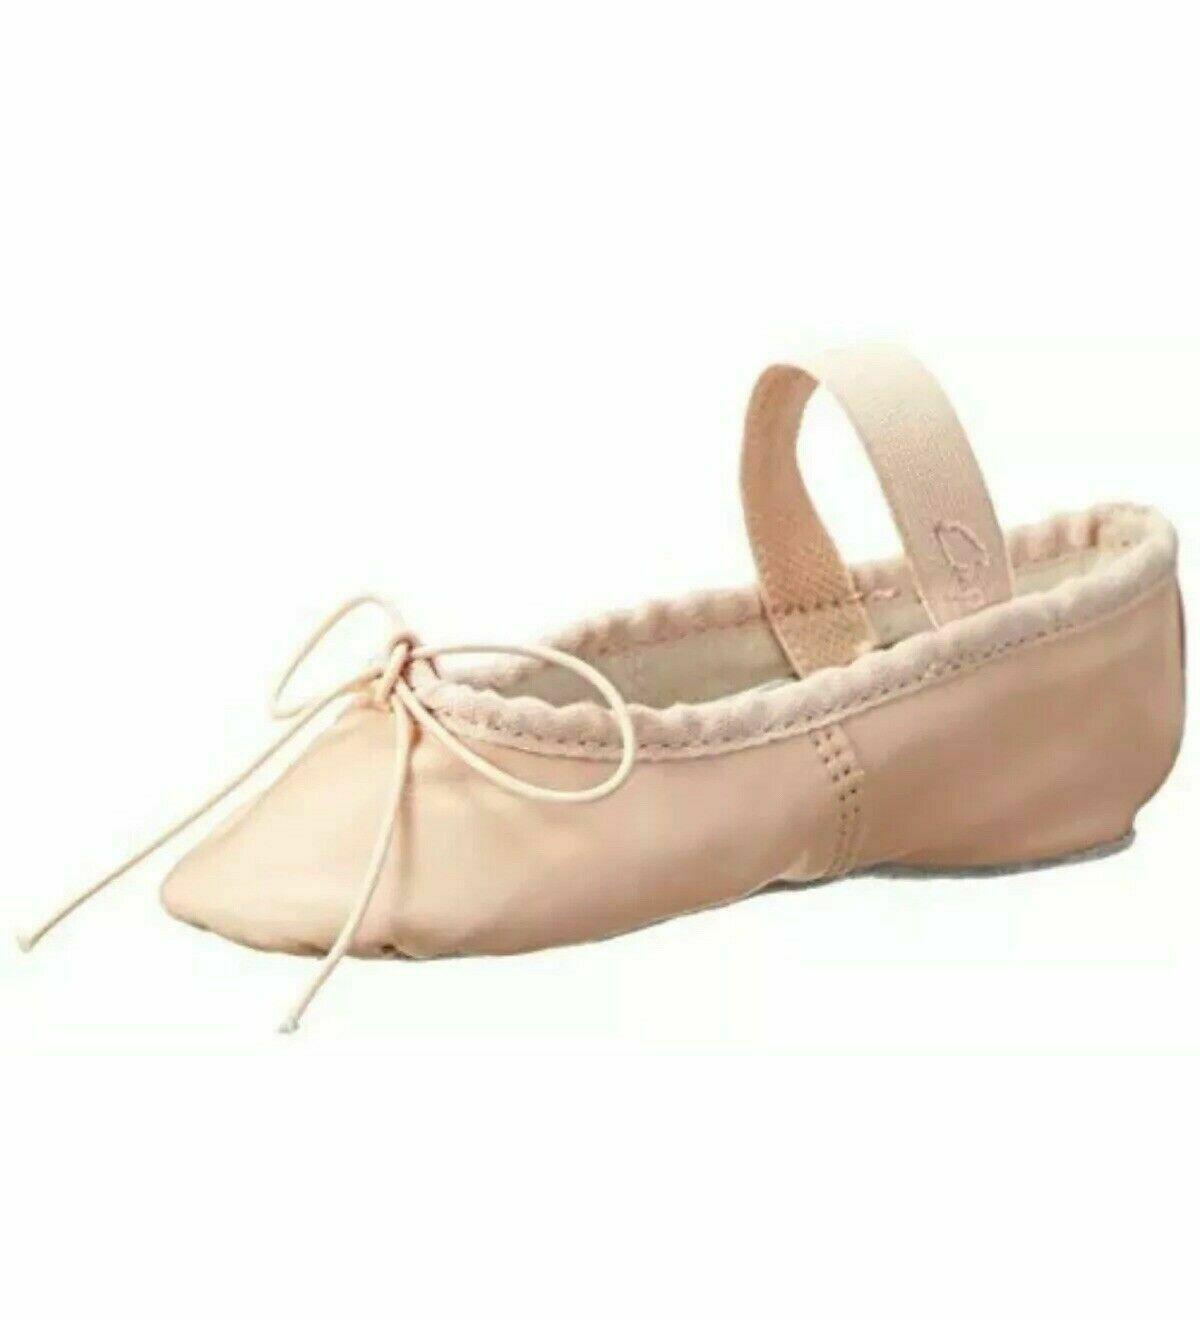 Capezio Adult Teknik 200 NPK Pink Full Sole Ballet Shoe Size 3.5B 3.5 B